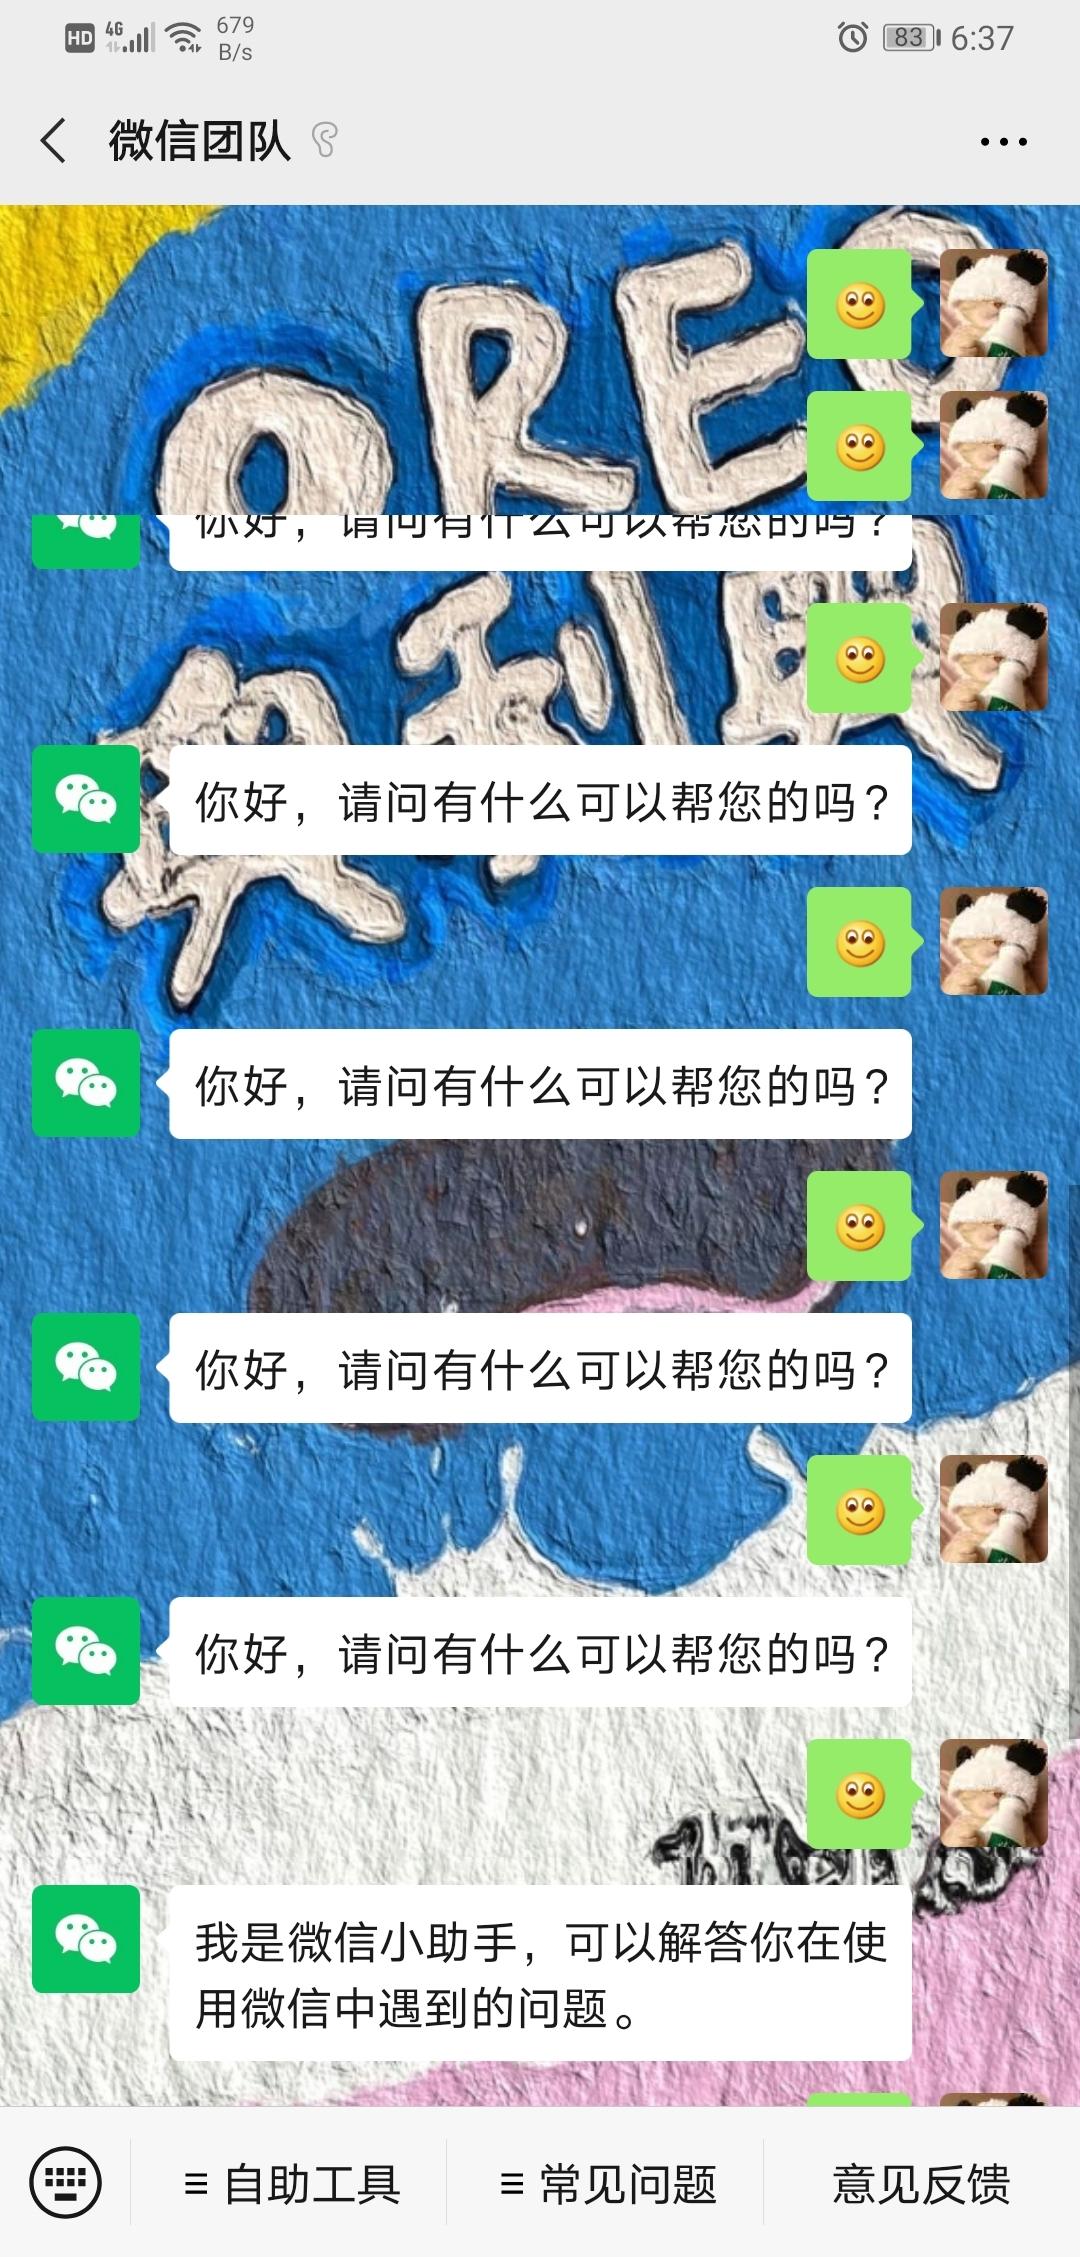 Screenshot_20200507_183750_com.tencent.mm.jpg